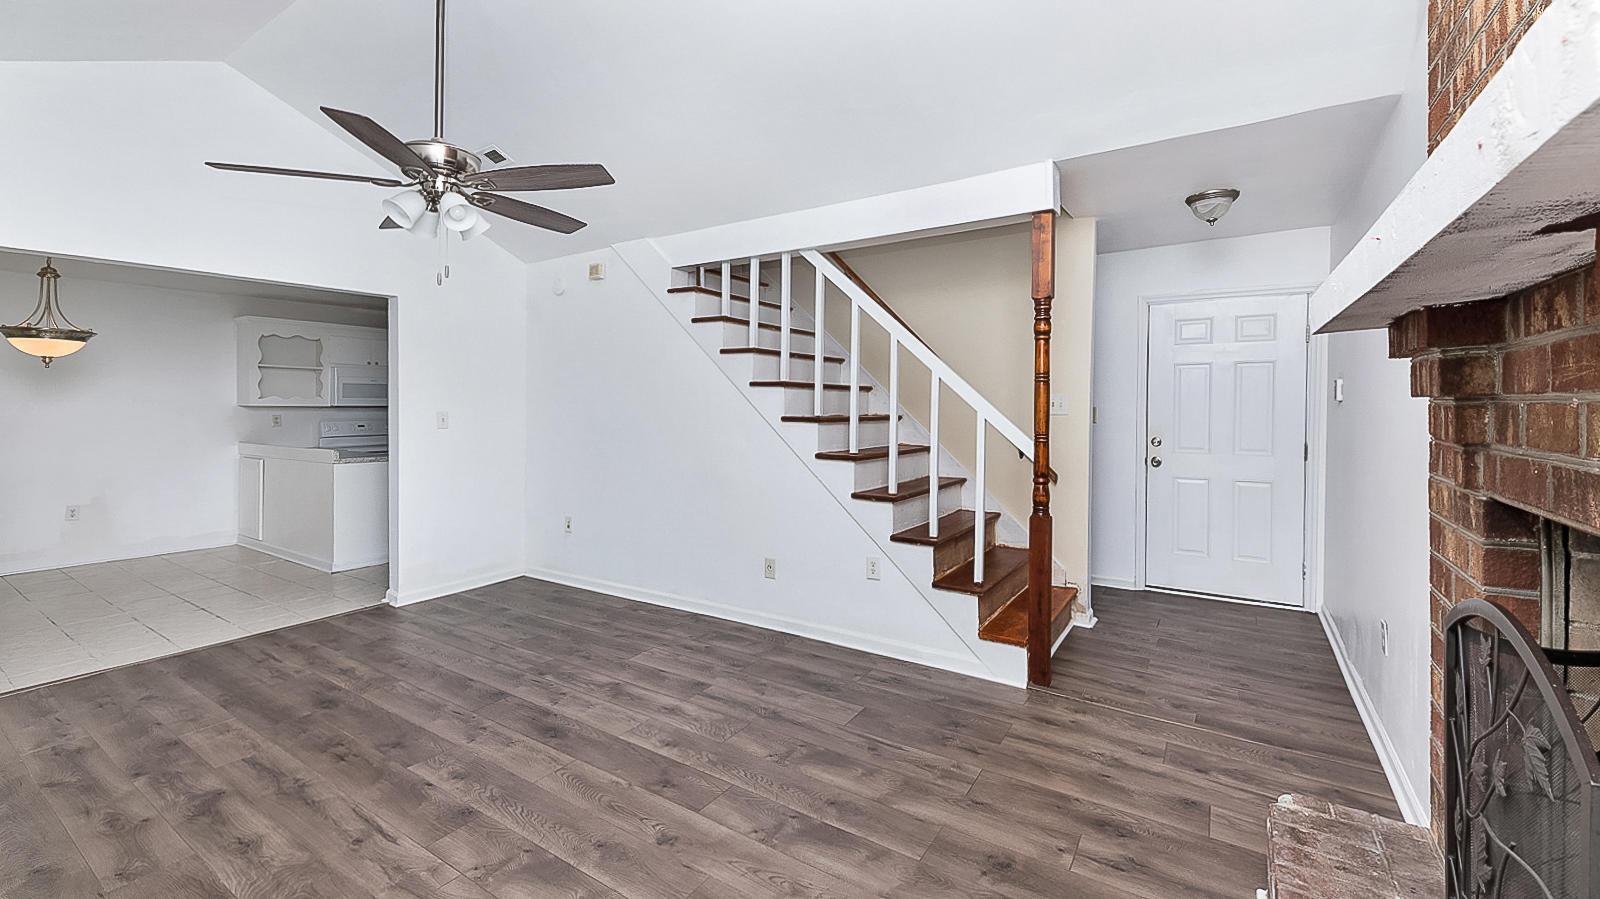 Ashley Villas Homes For Sale - 4315 Briarstone, North Charleston, SC - 7